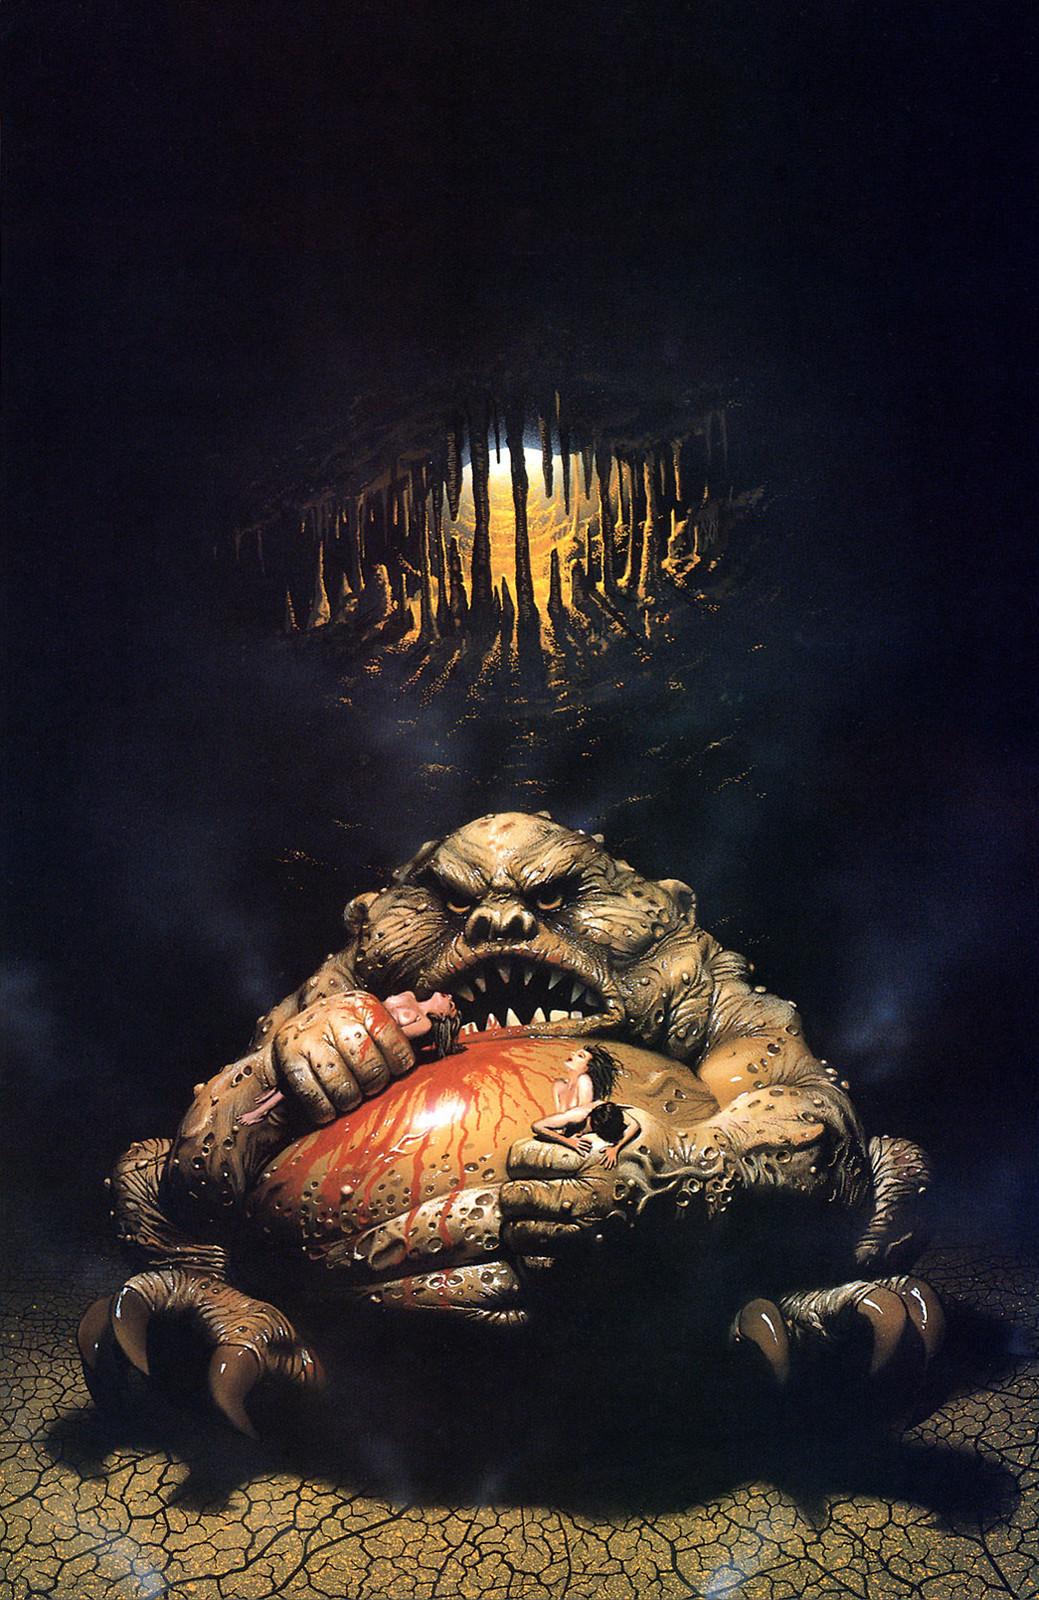 Tim White - HP Lovecraft Omnibus 3, The Haunter of the Dark